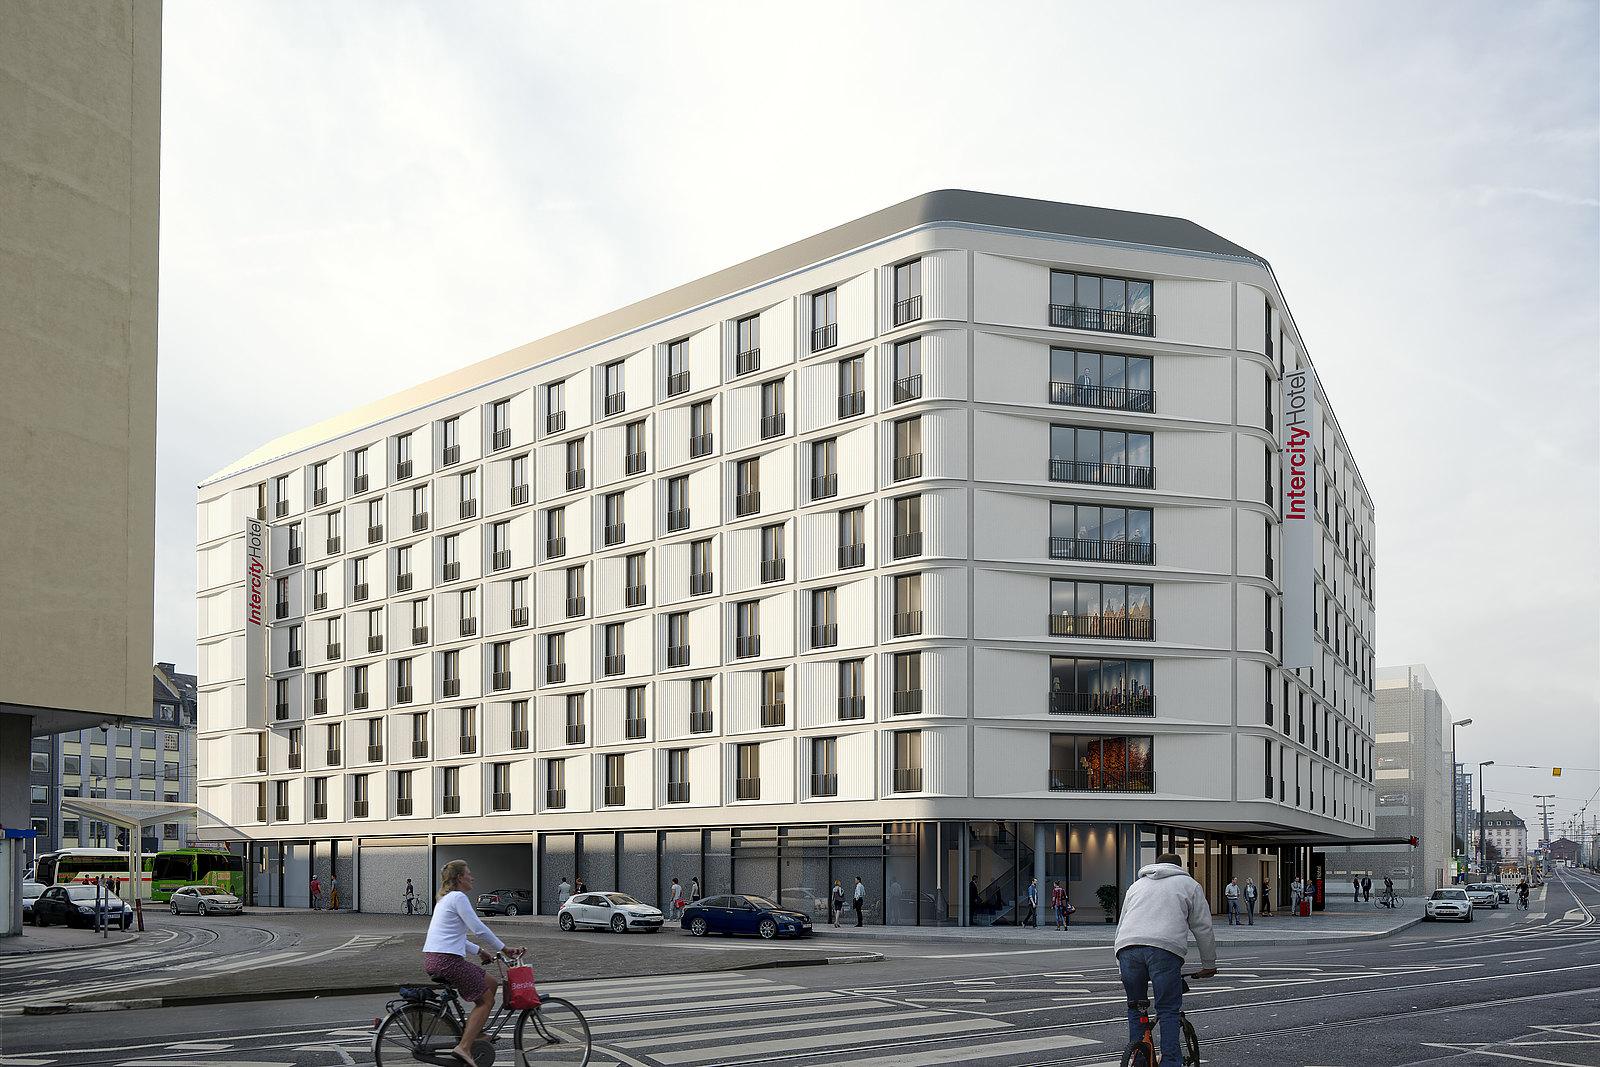 Hotel am Hauptbahnhof Frankfurt am Main